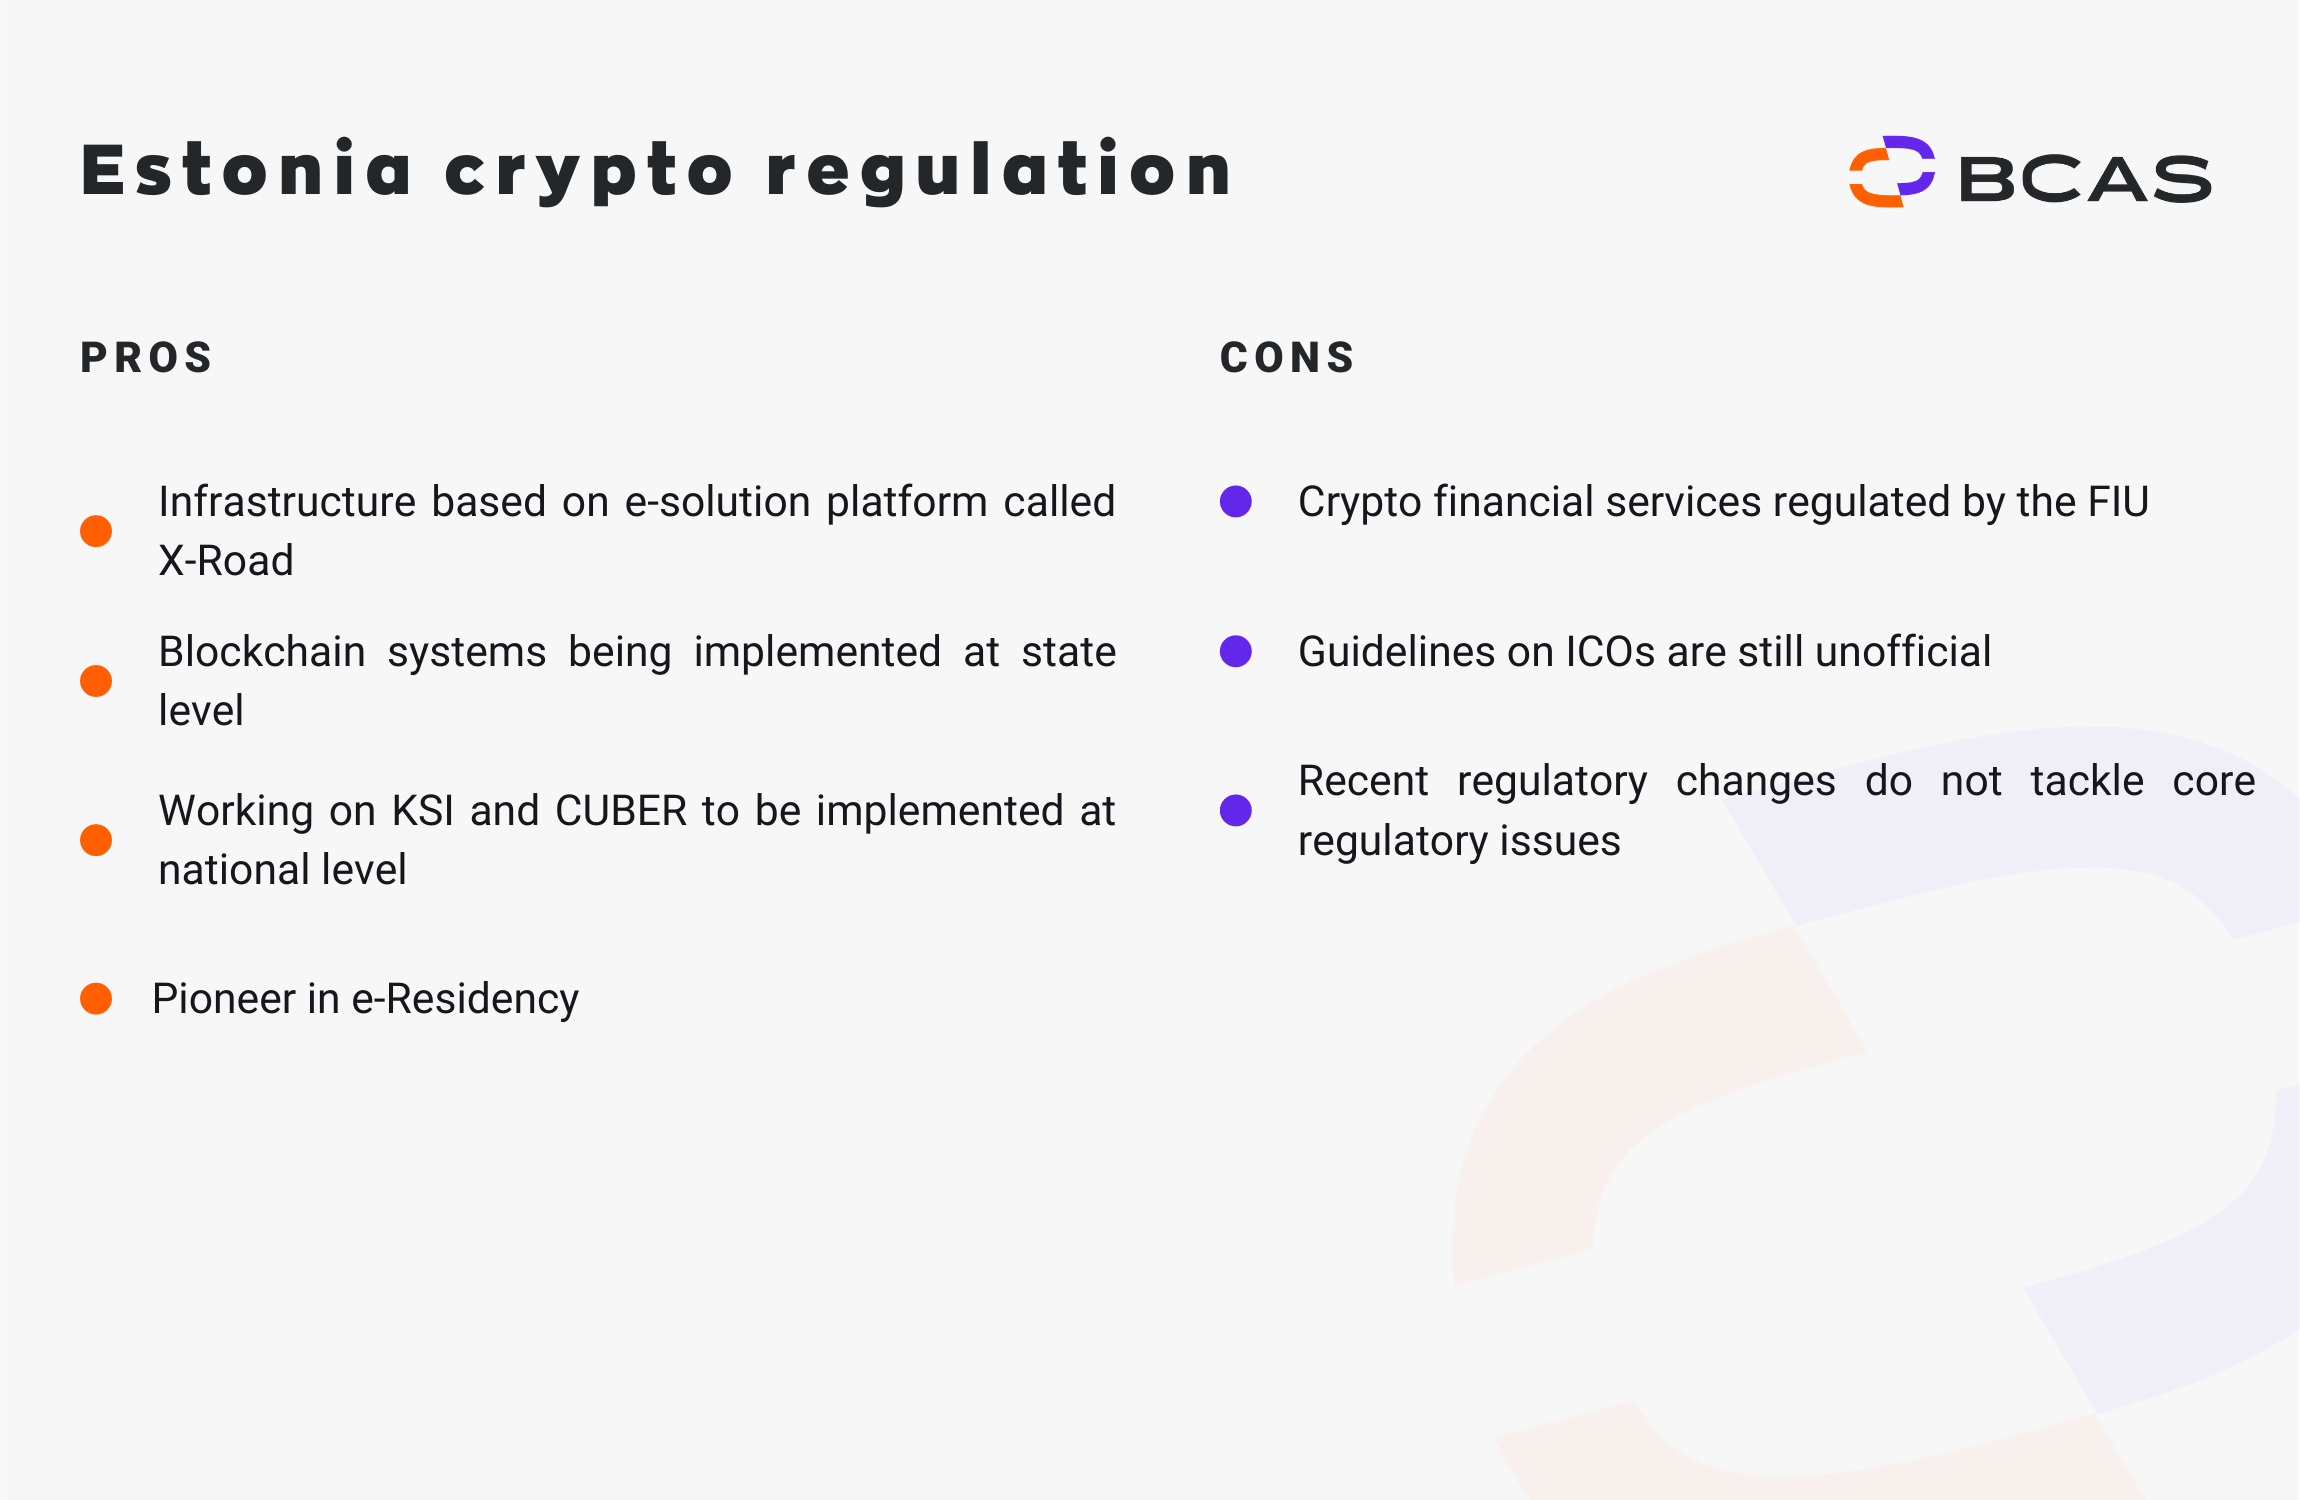 Estonia crypto regulation (1)